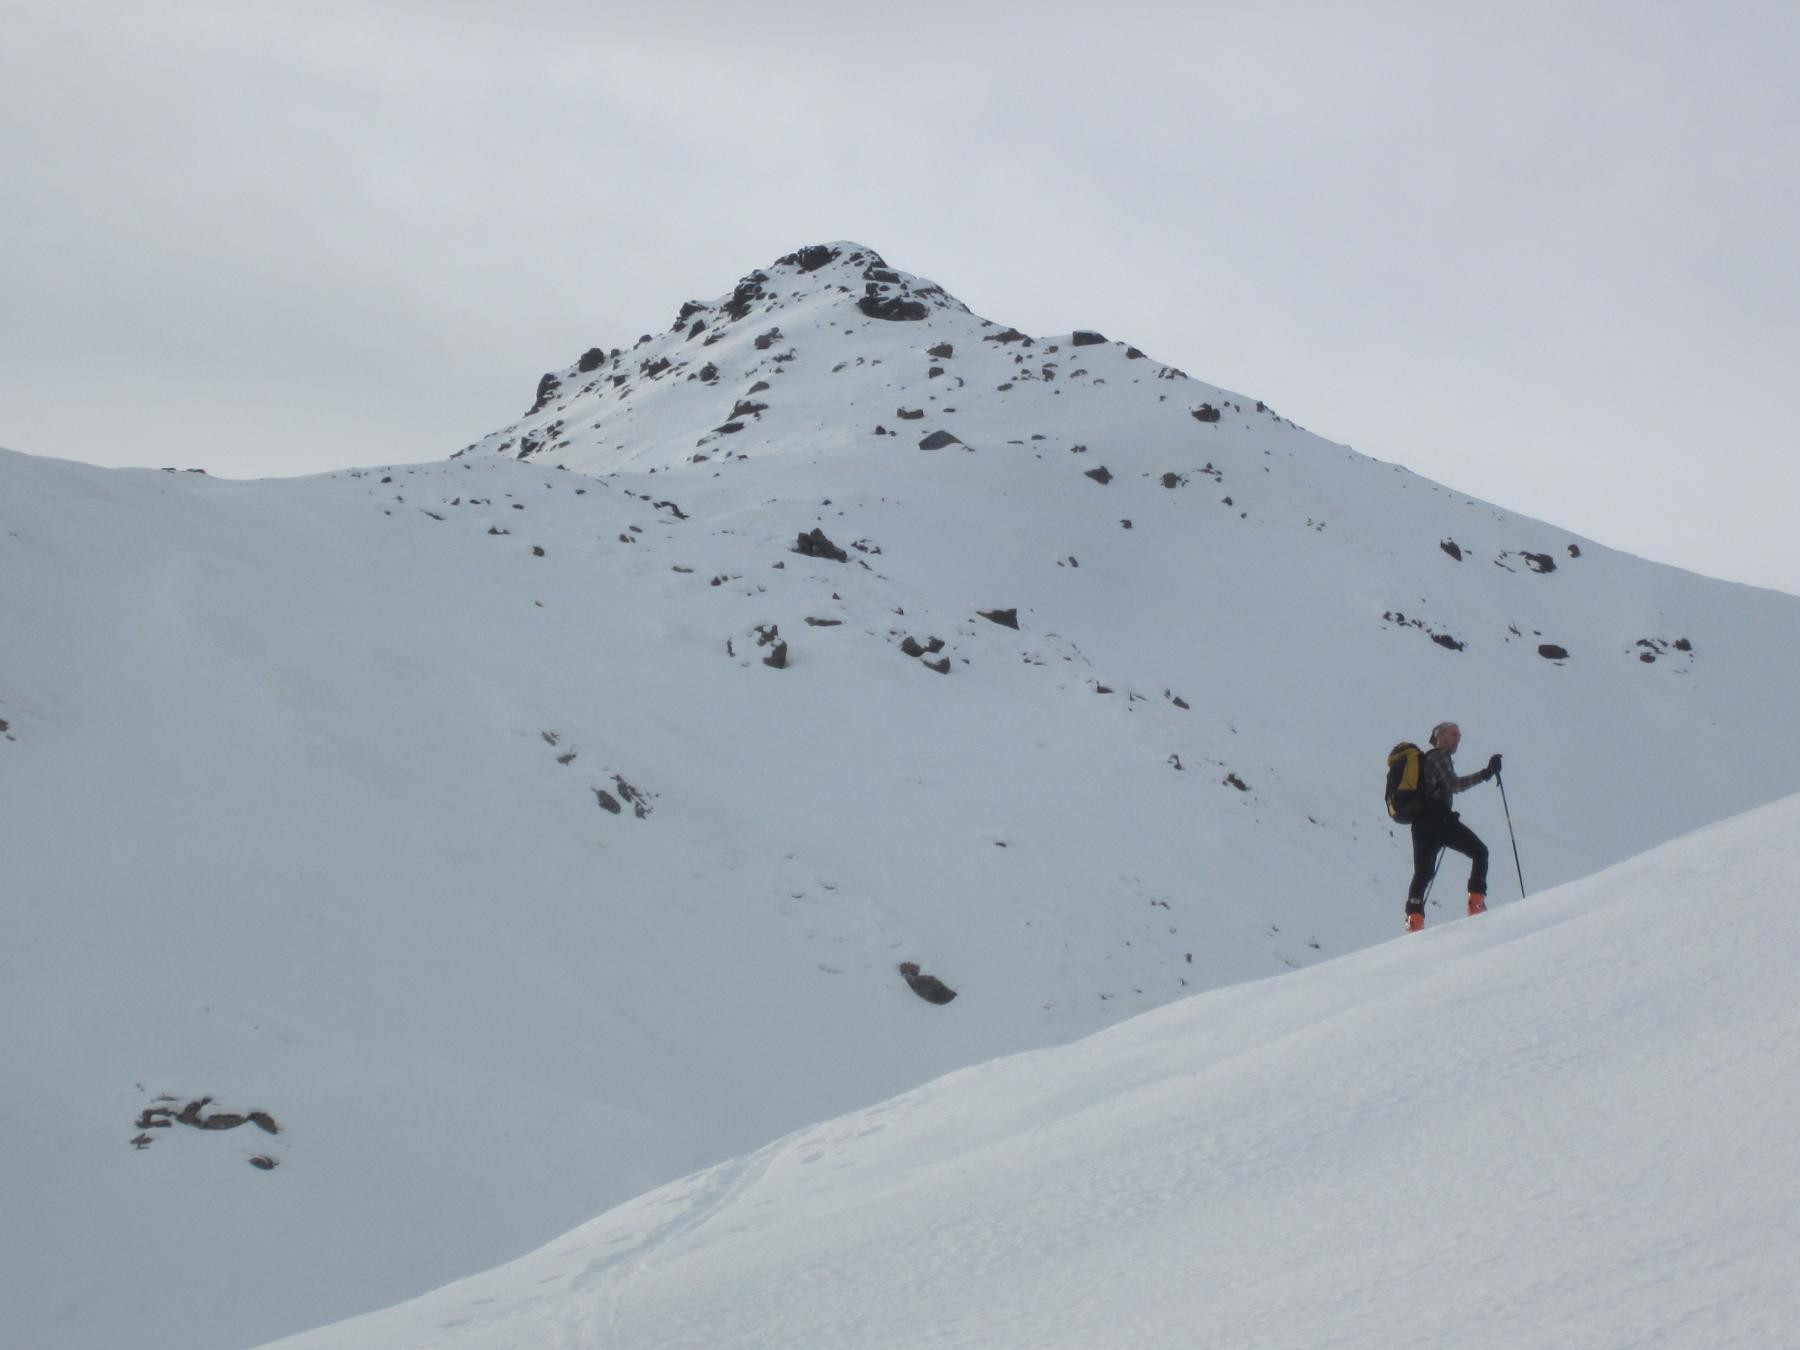 Pelata (Costa) quota 2478 m diretta NE da Meire Bigoire 2014-12-24